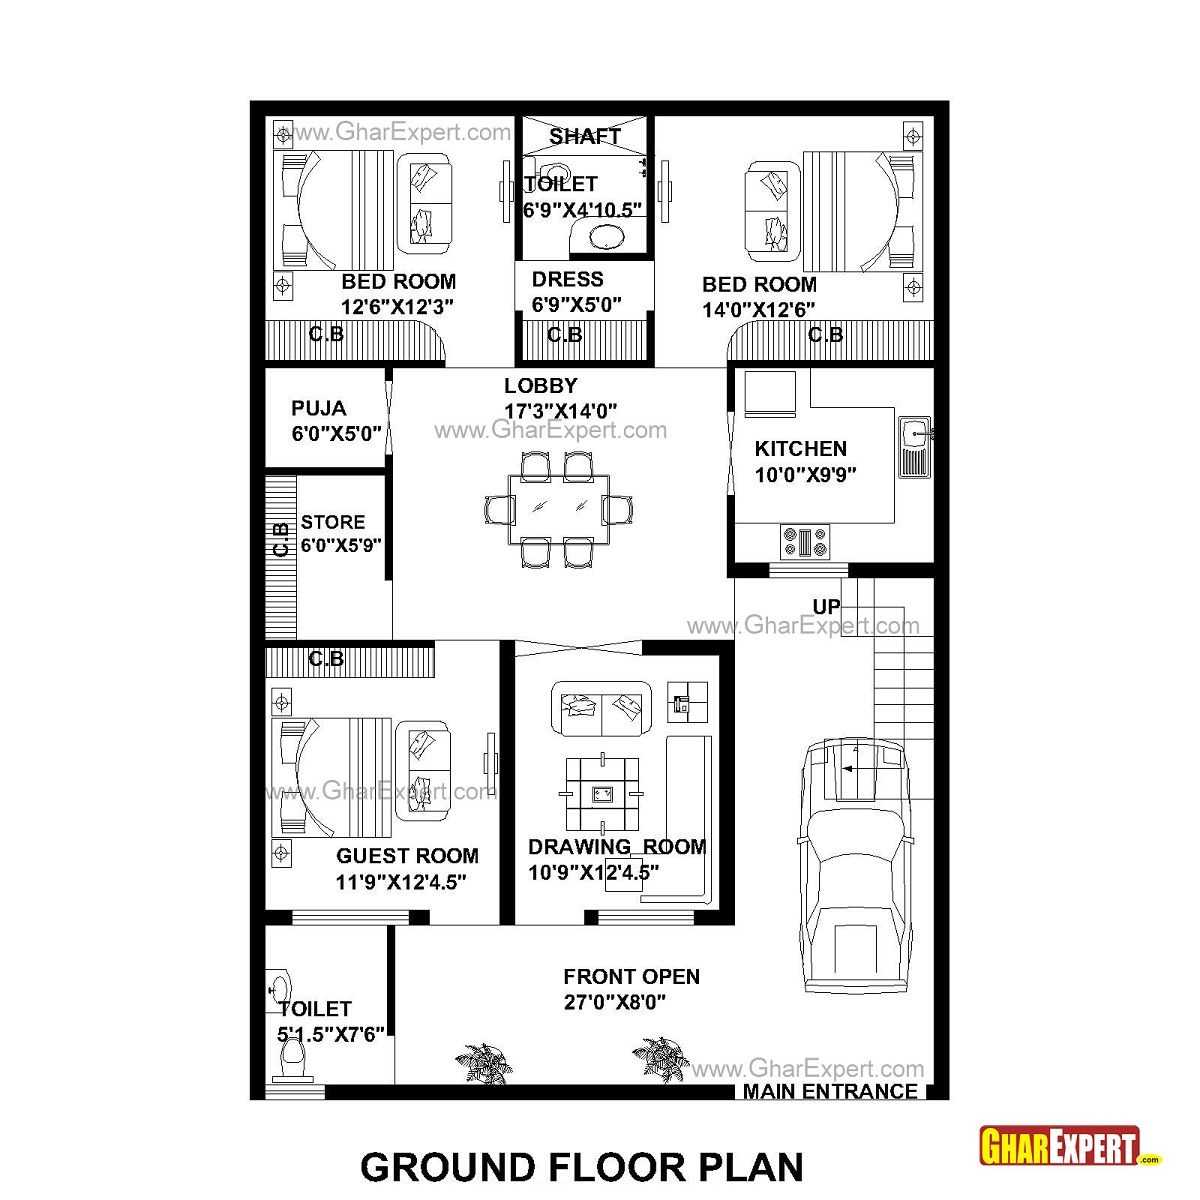 House design 30 x 45 - Found On Google From Gharexpert Com